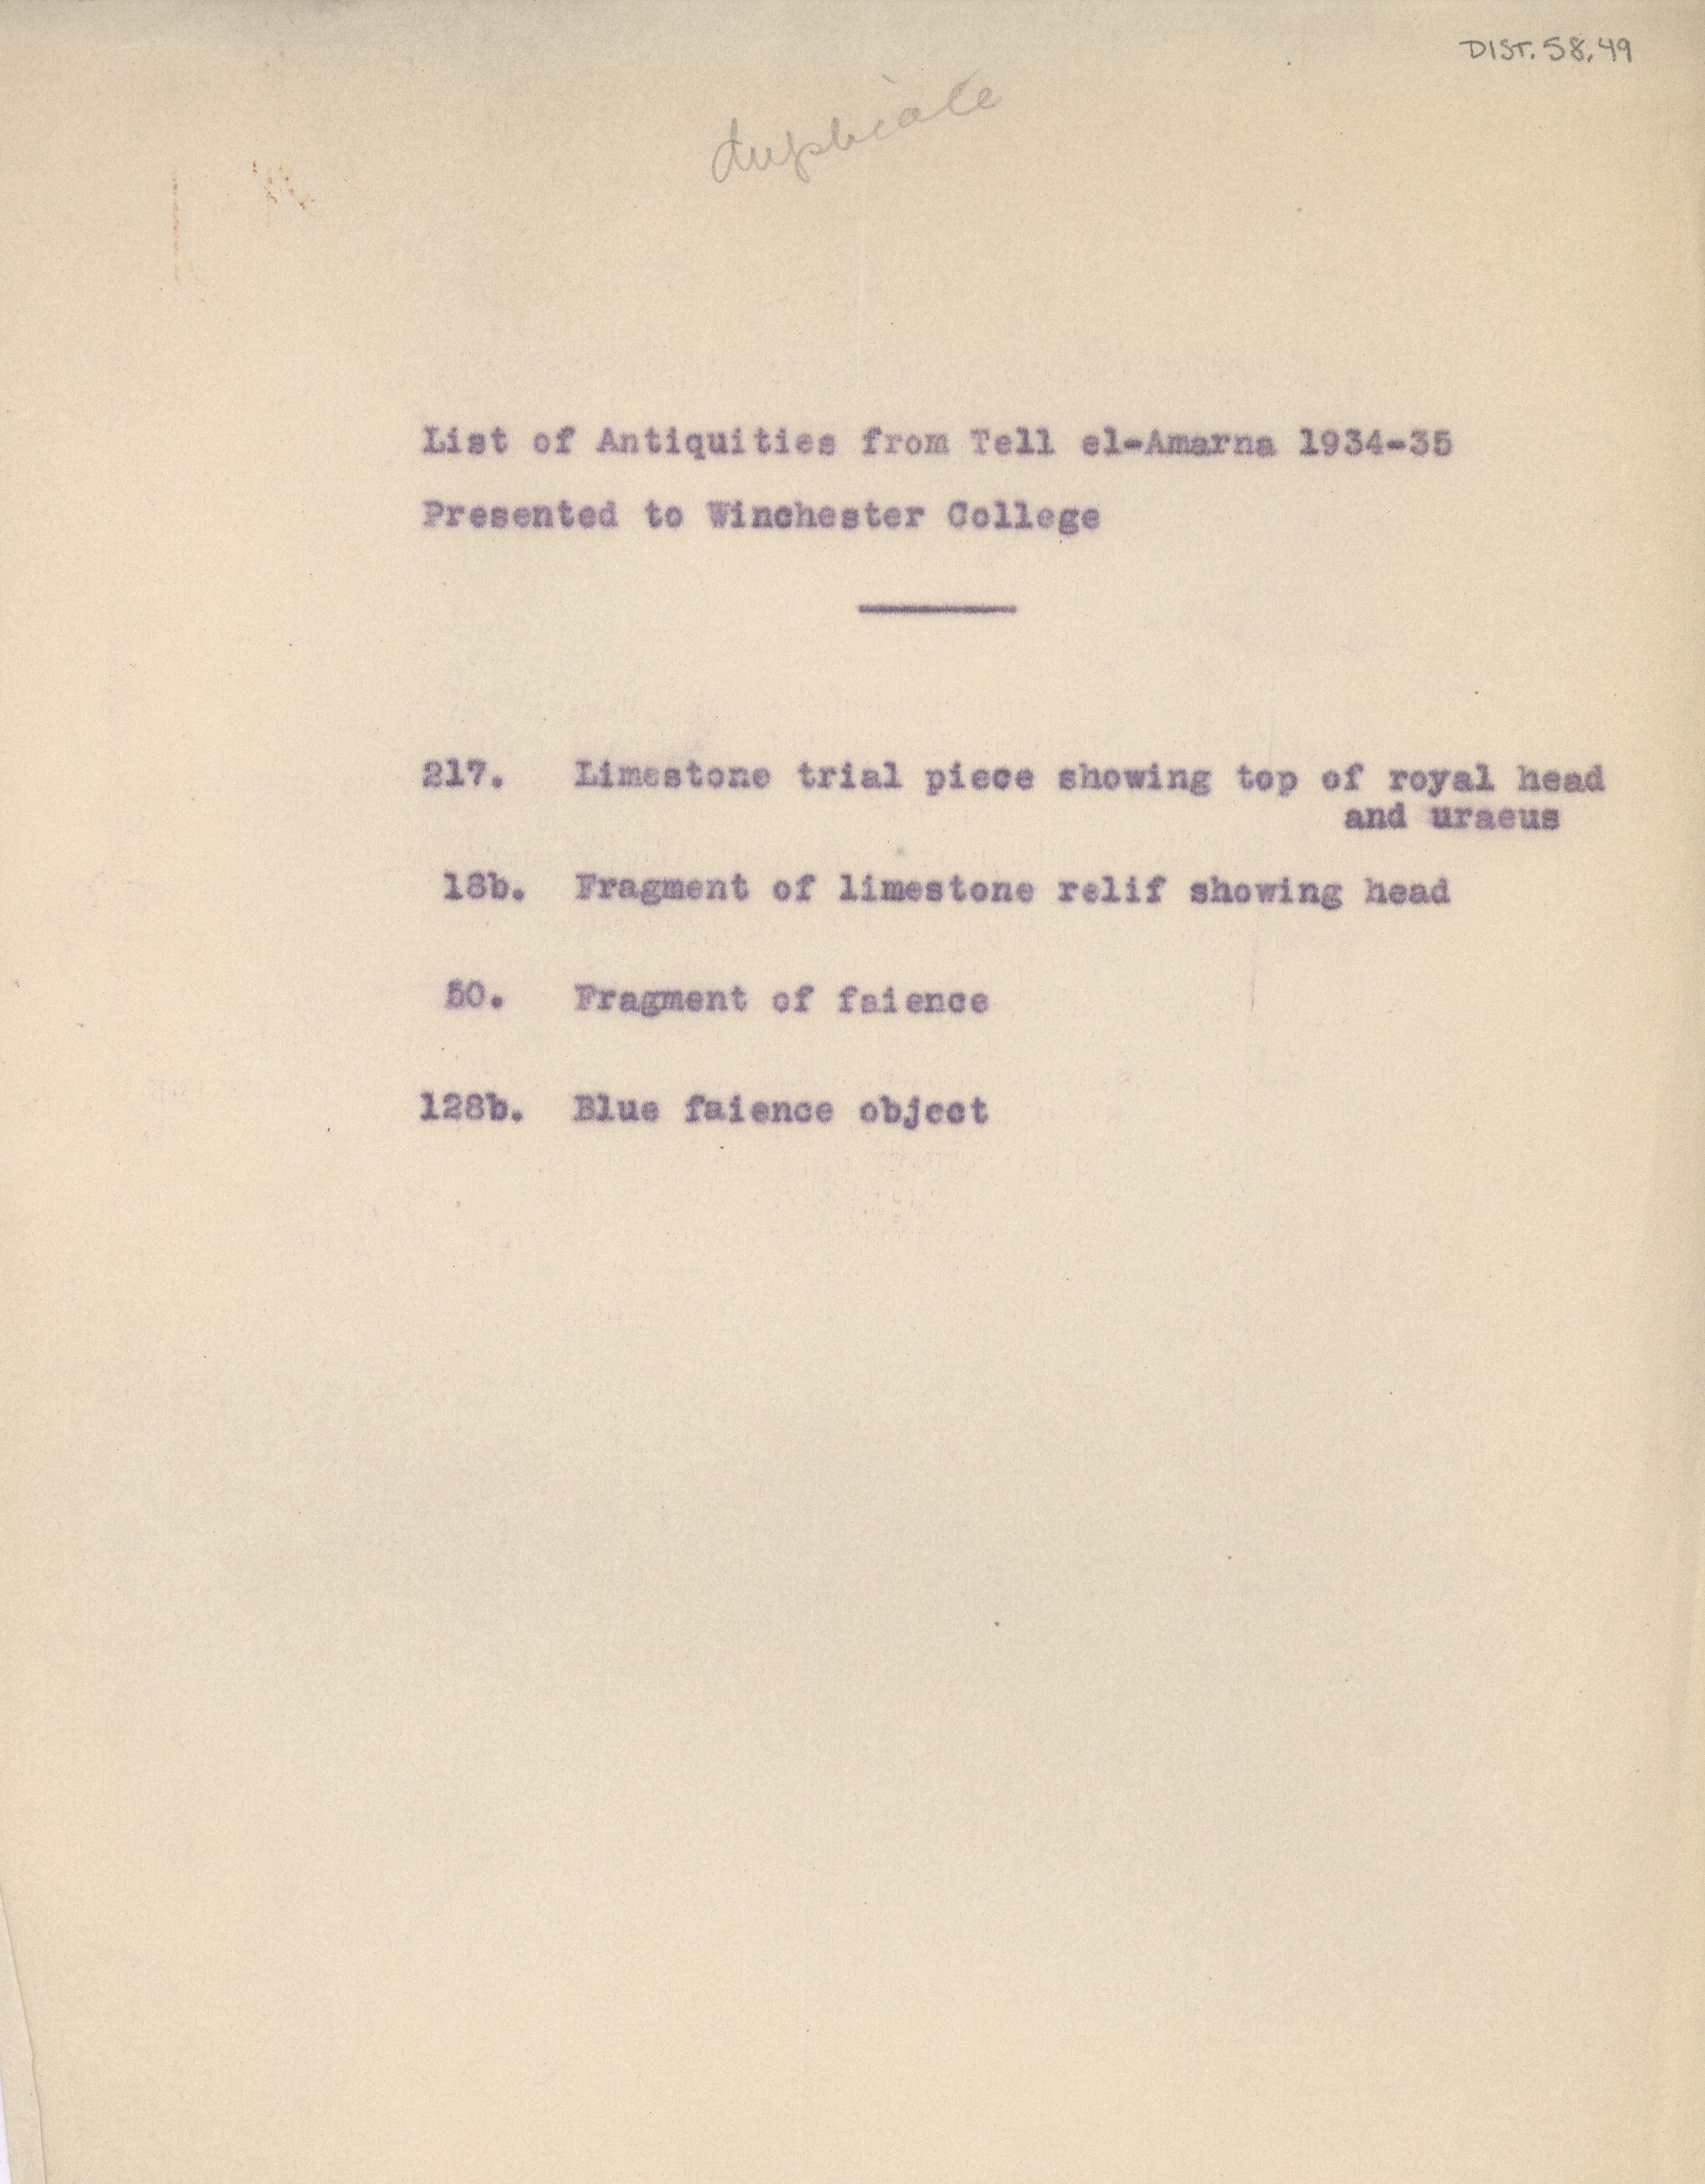 1934-35 el-Amarna DIST.58.49